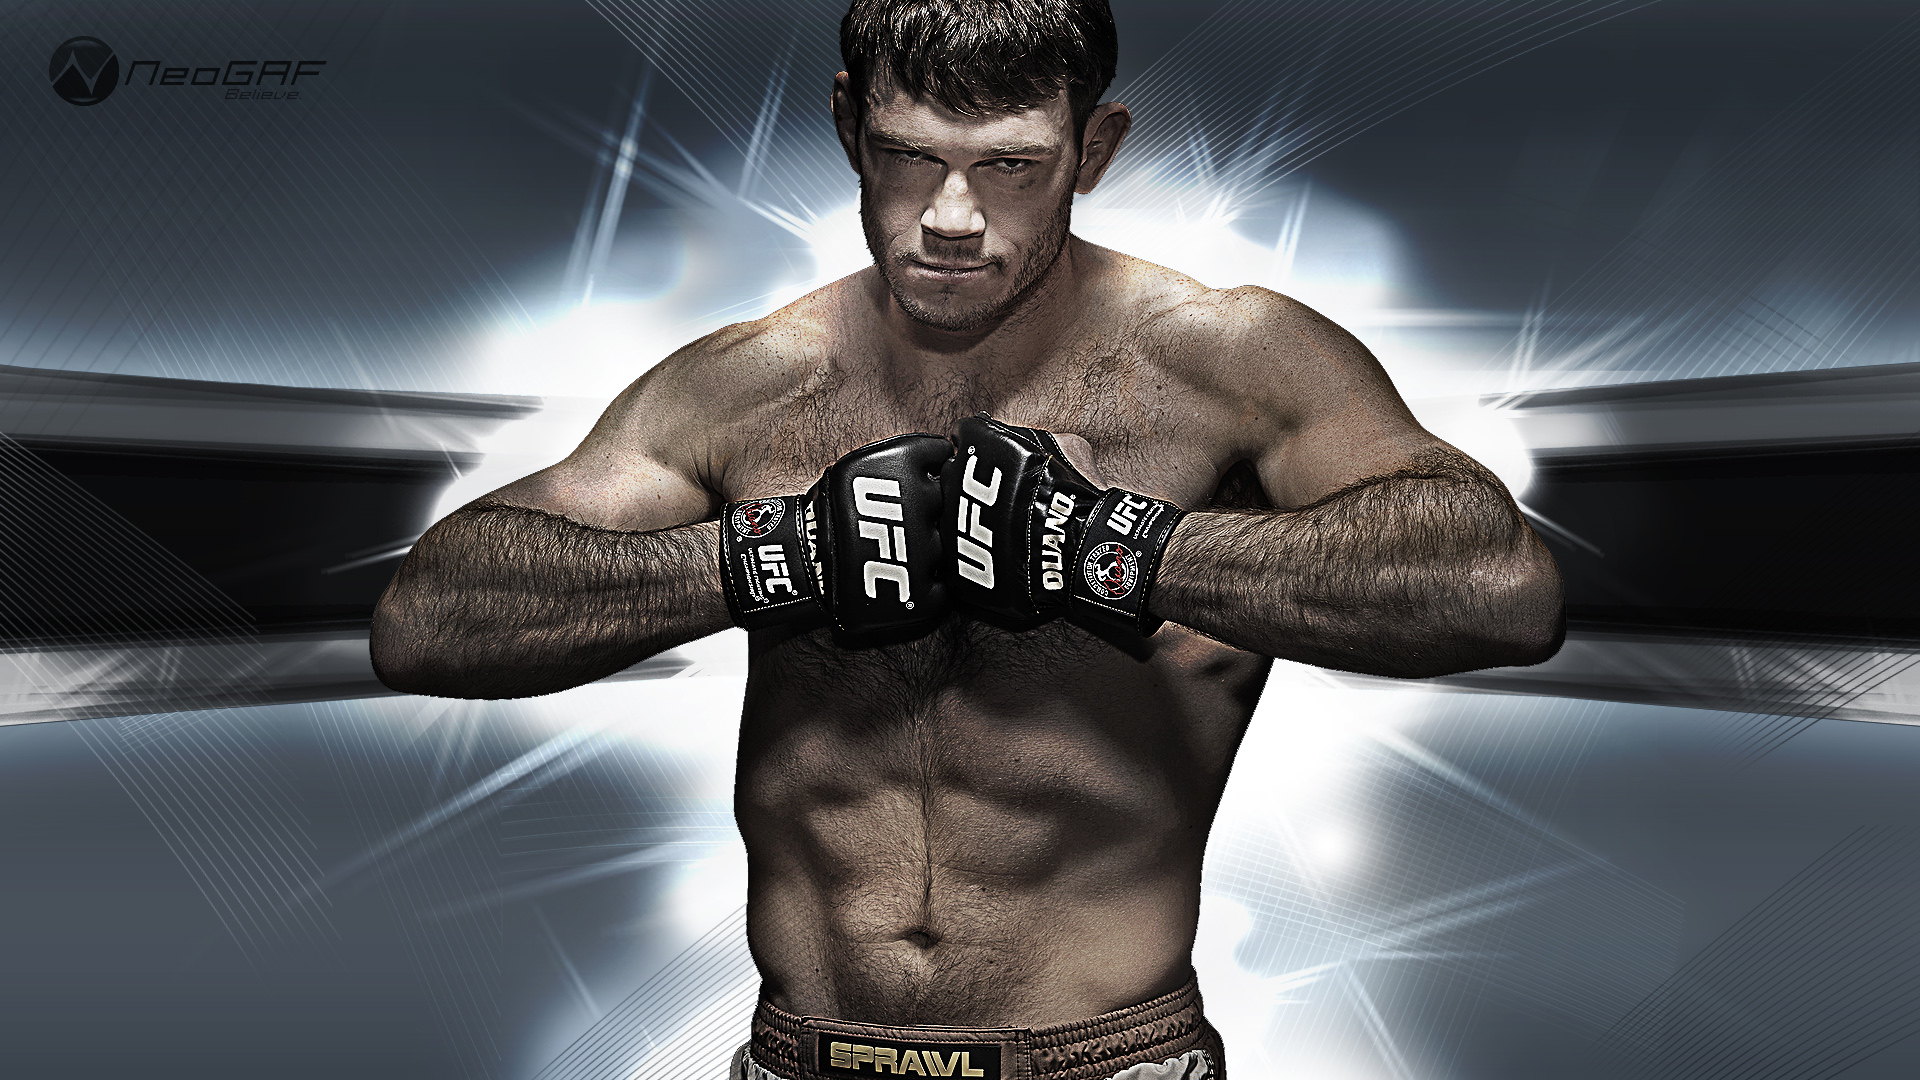 UFC Wallpaper High Definiiton 1920x1080